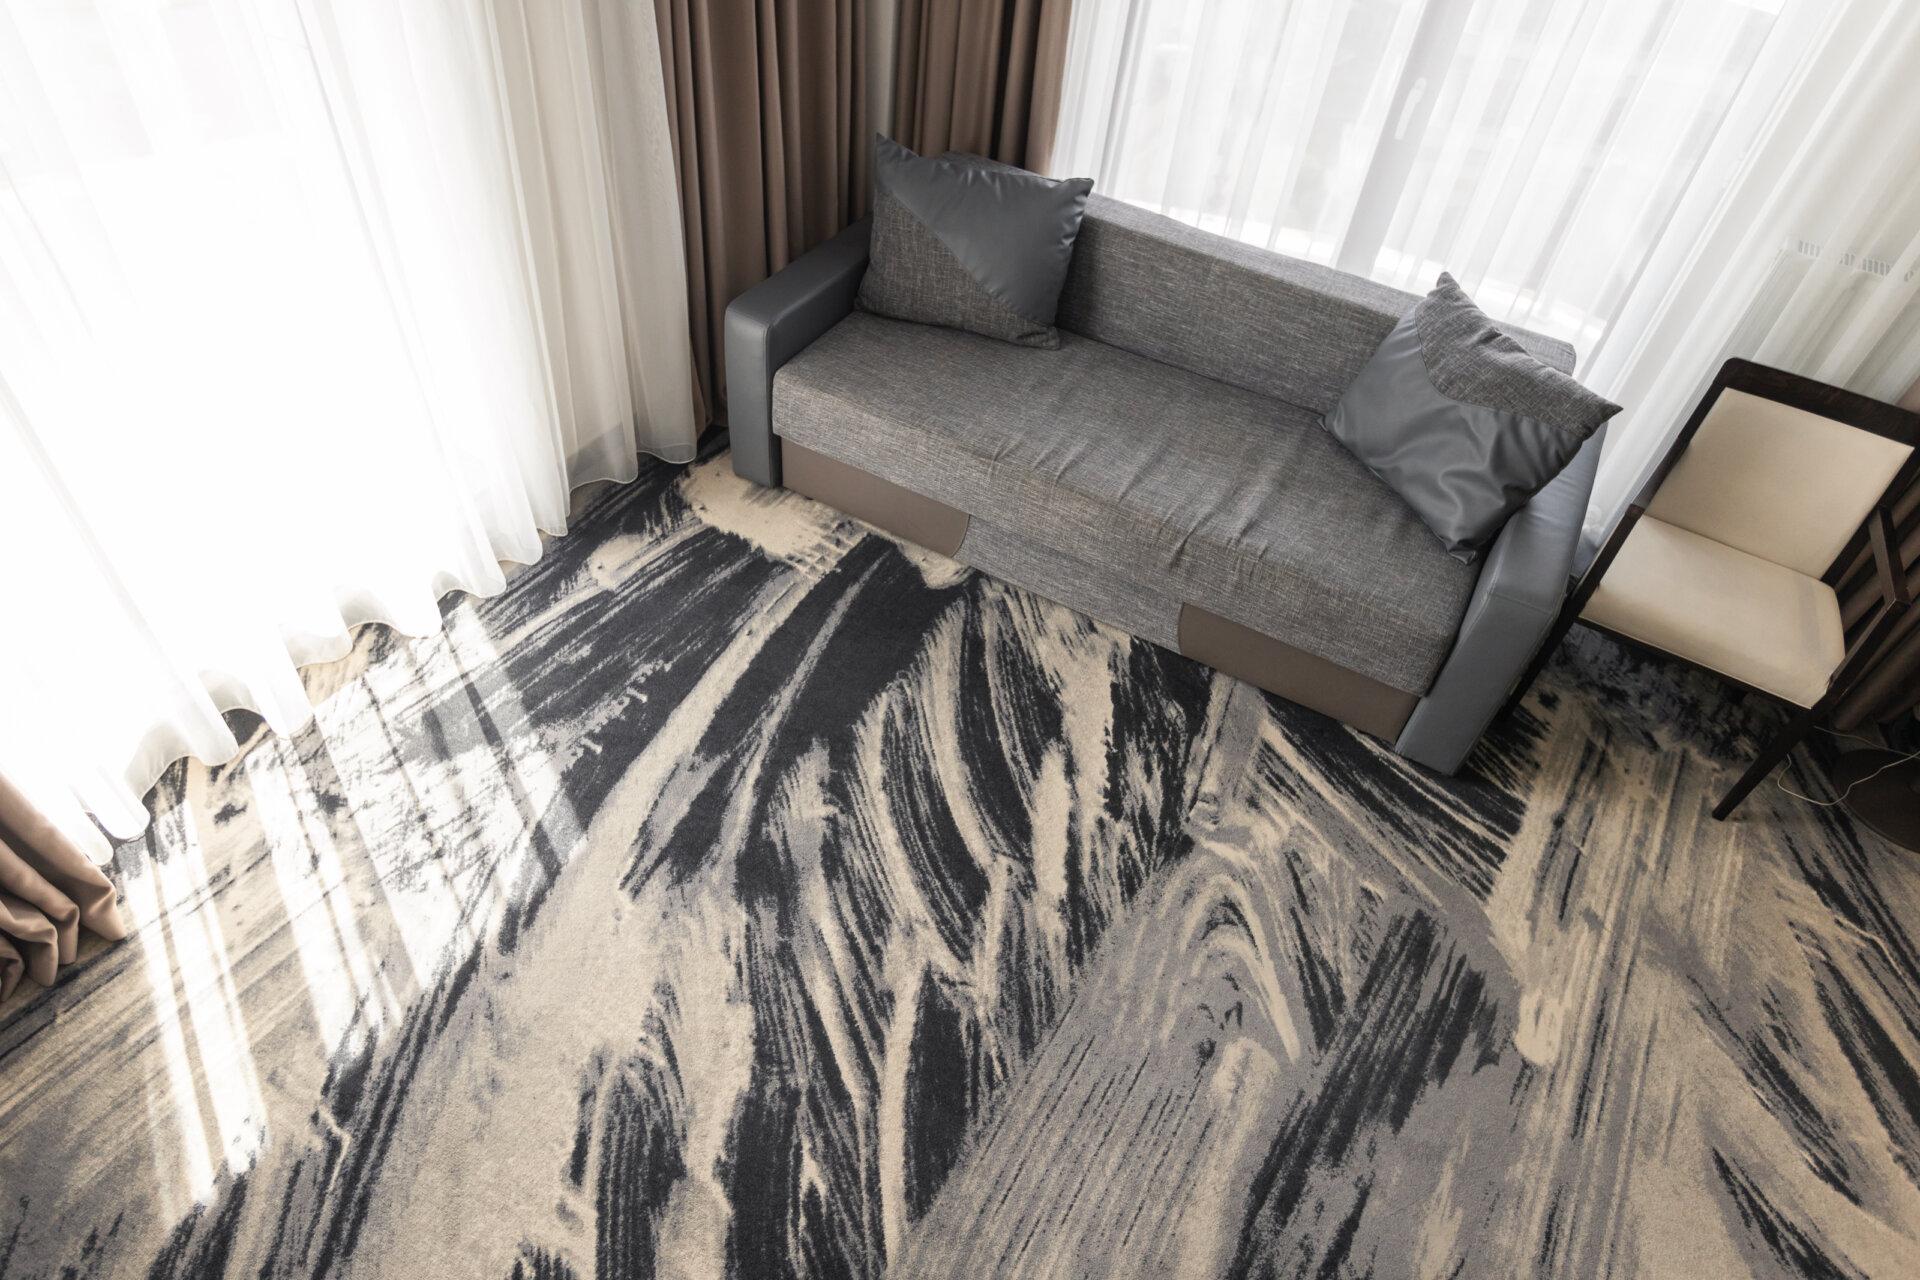 20210524-carpet&more-mamaia-hotel-scapino-by-hugmedia-013